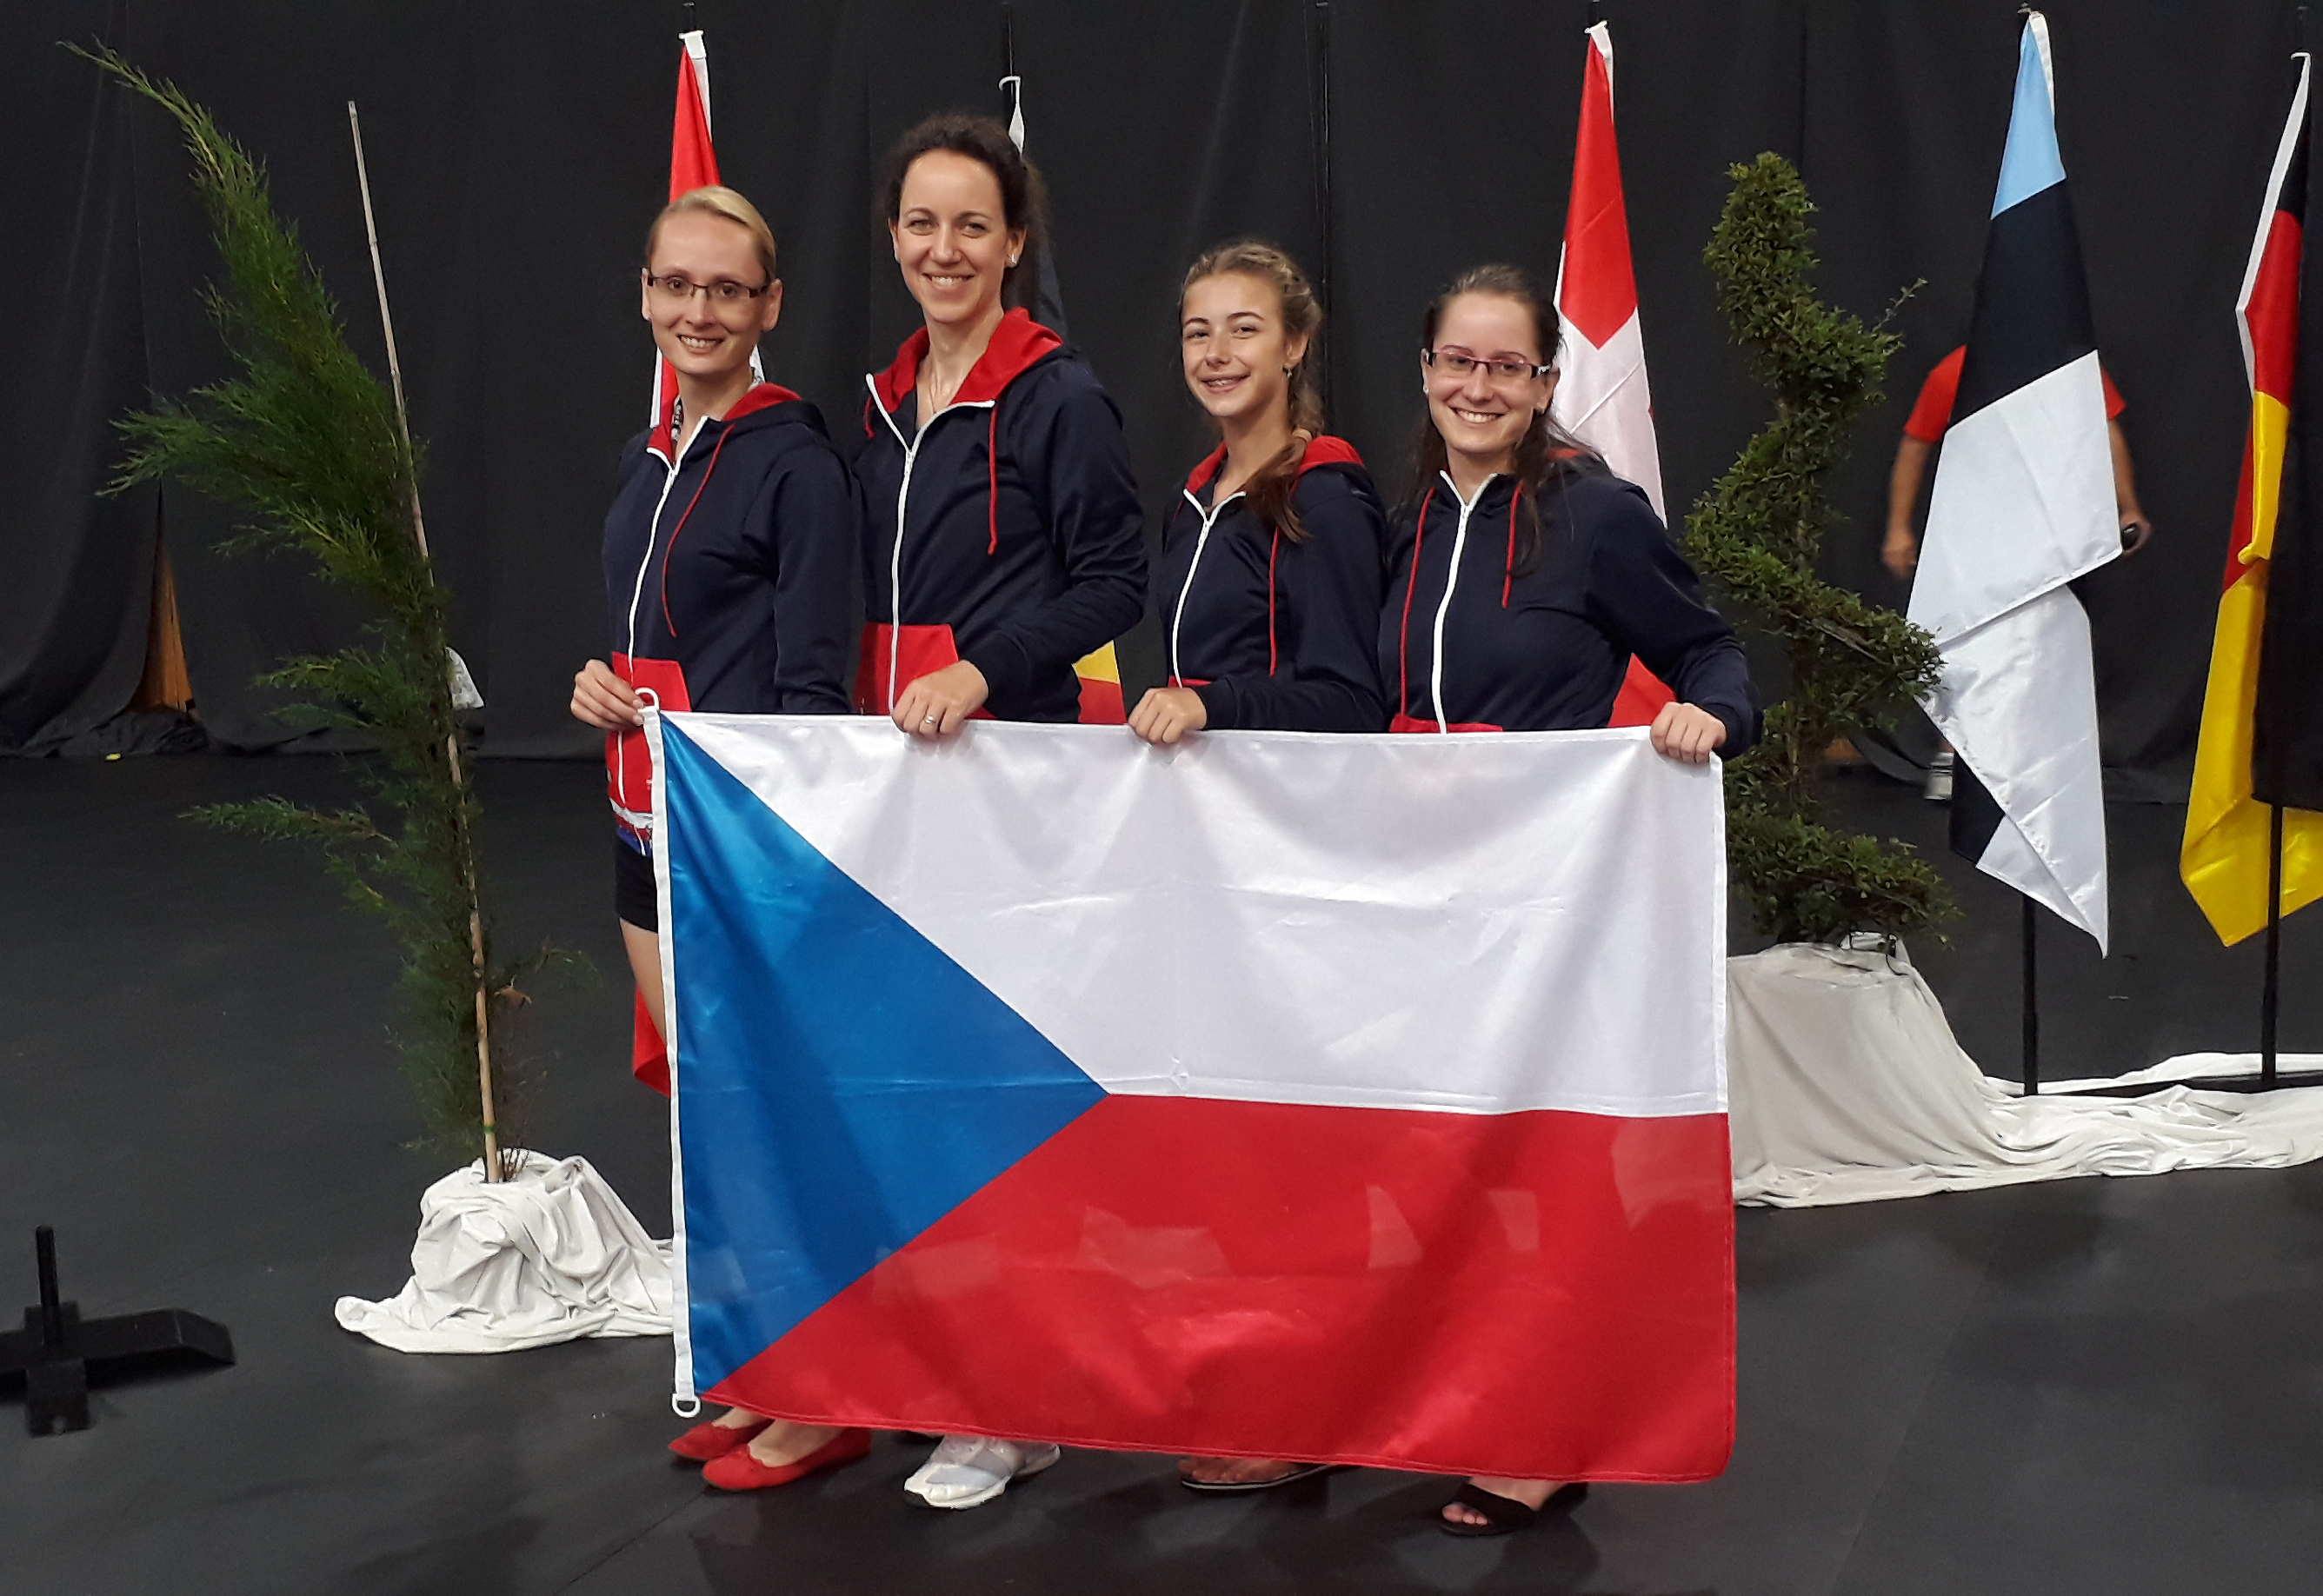 European rope skipping Championships 2017 Braga, Portugal